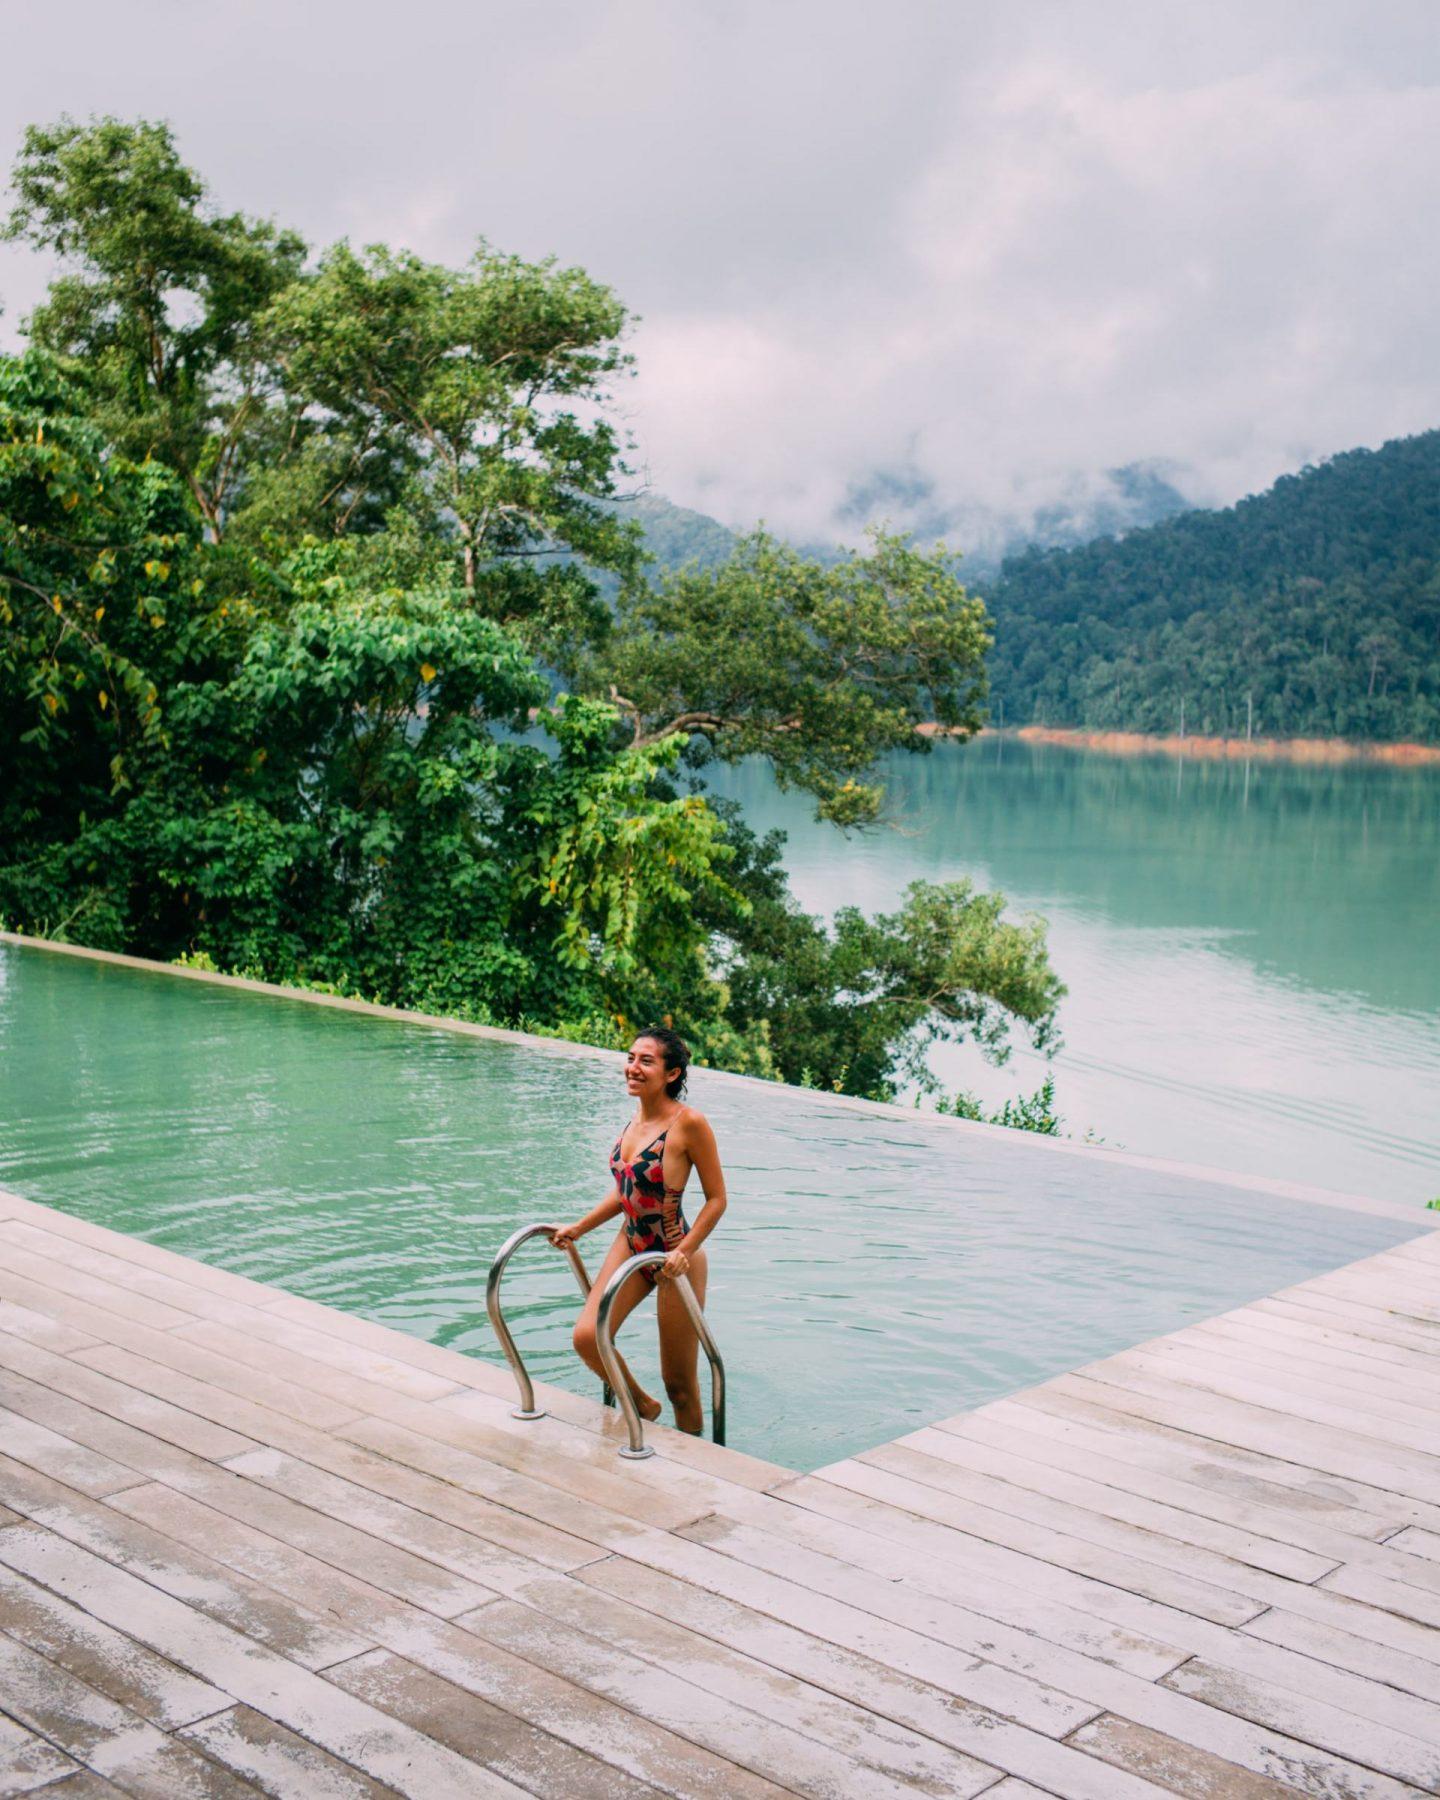 women in swimming pool next to a lake